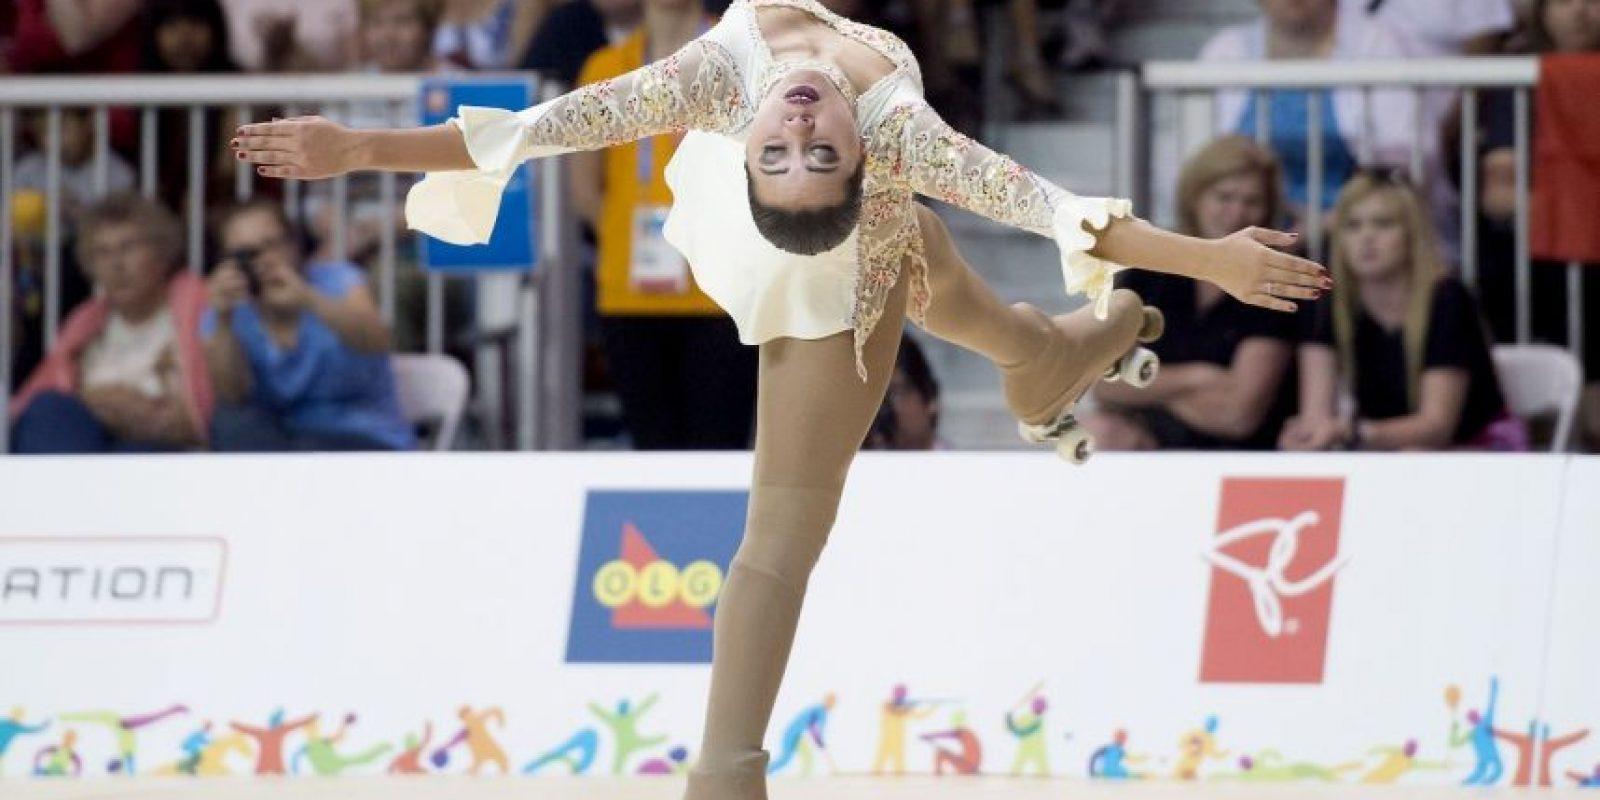 Dio a Argentina el primer oro Foto:Getty Images